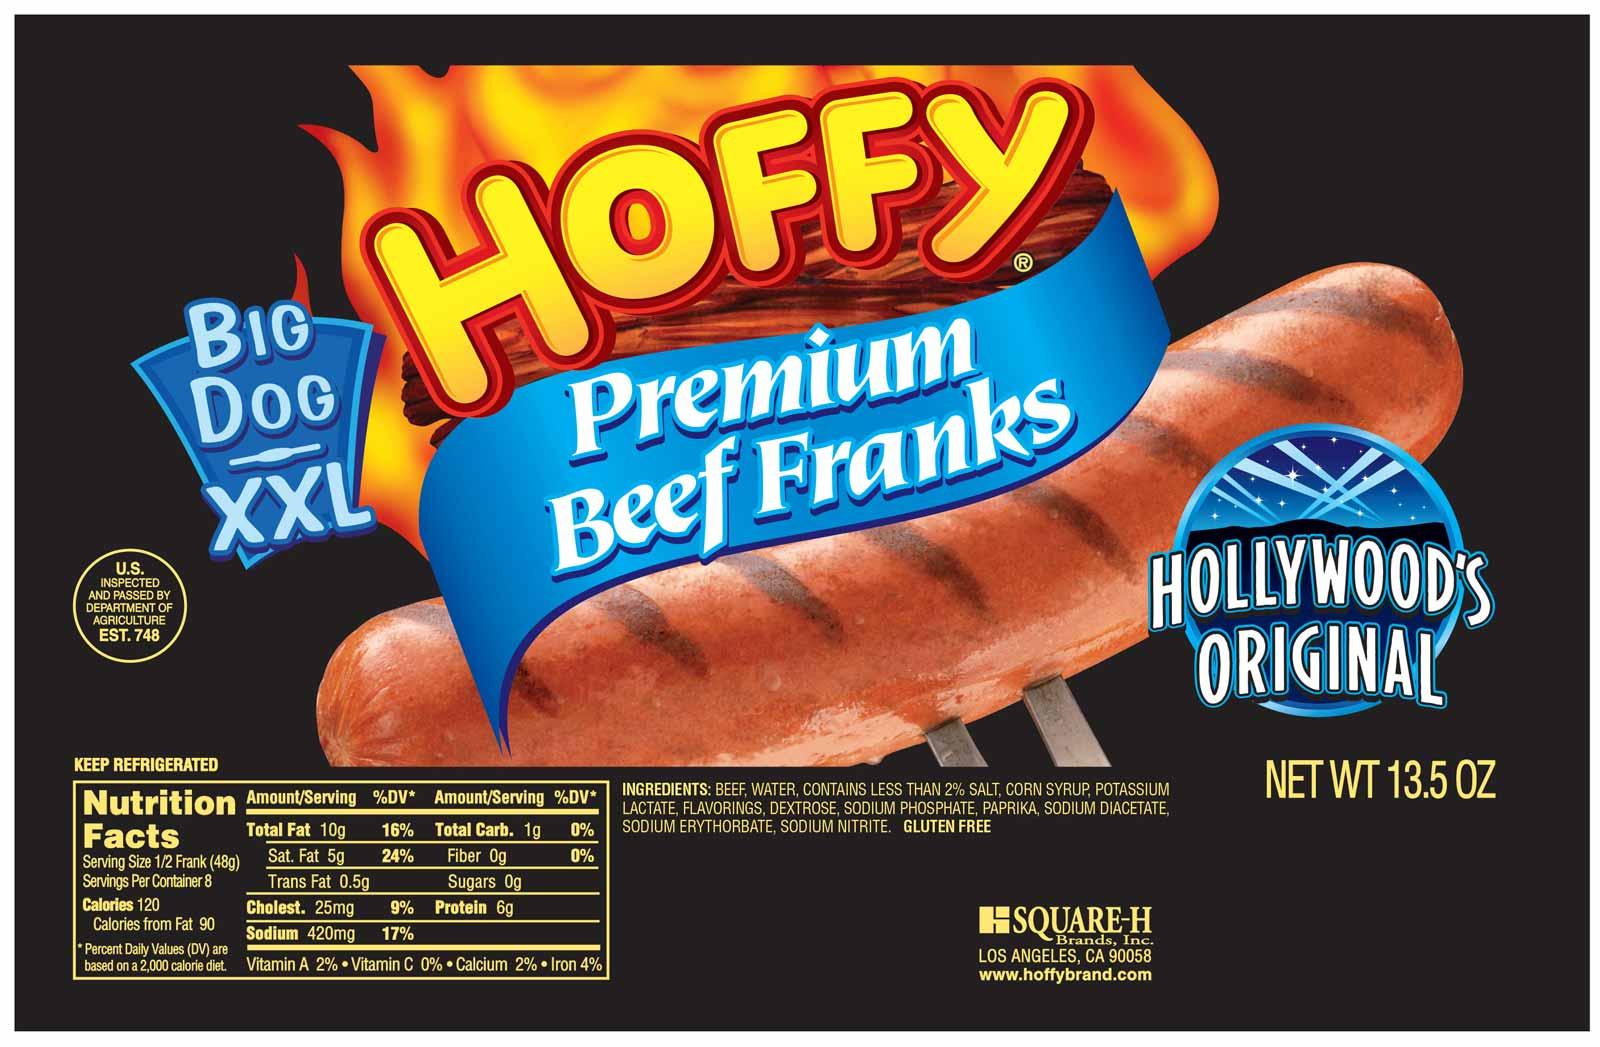 Big Dog XXL Premium Beef Franks